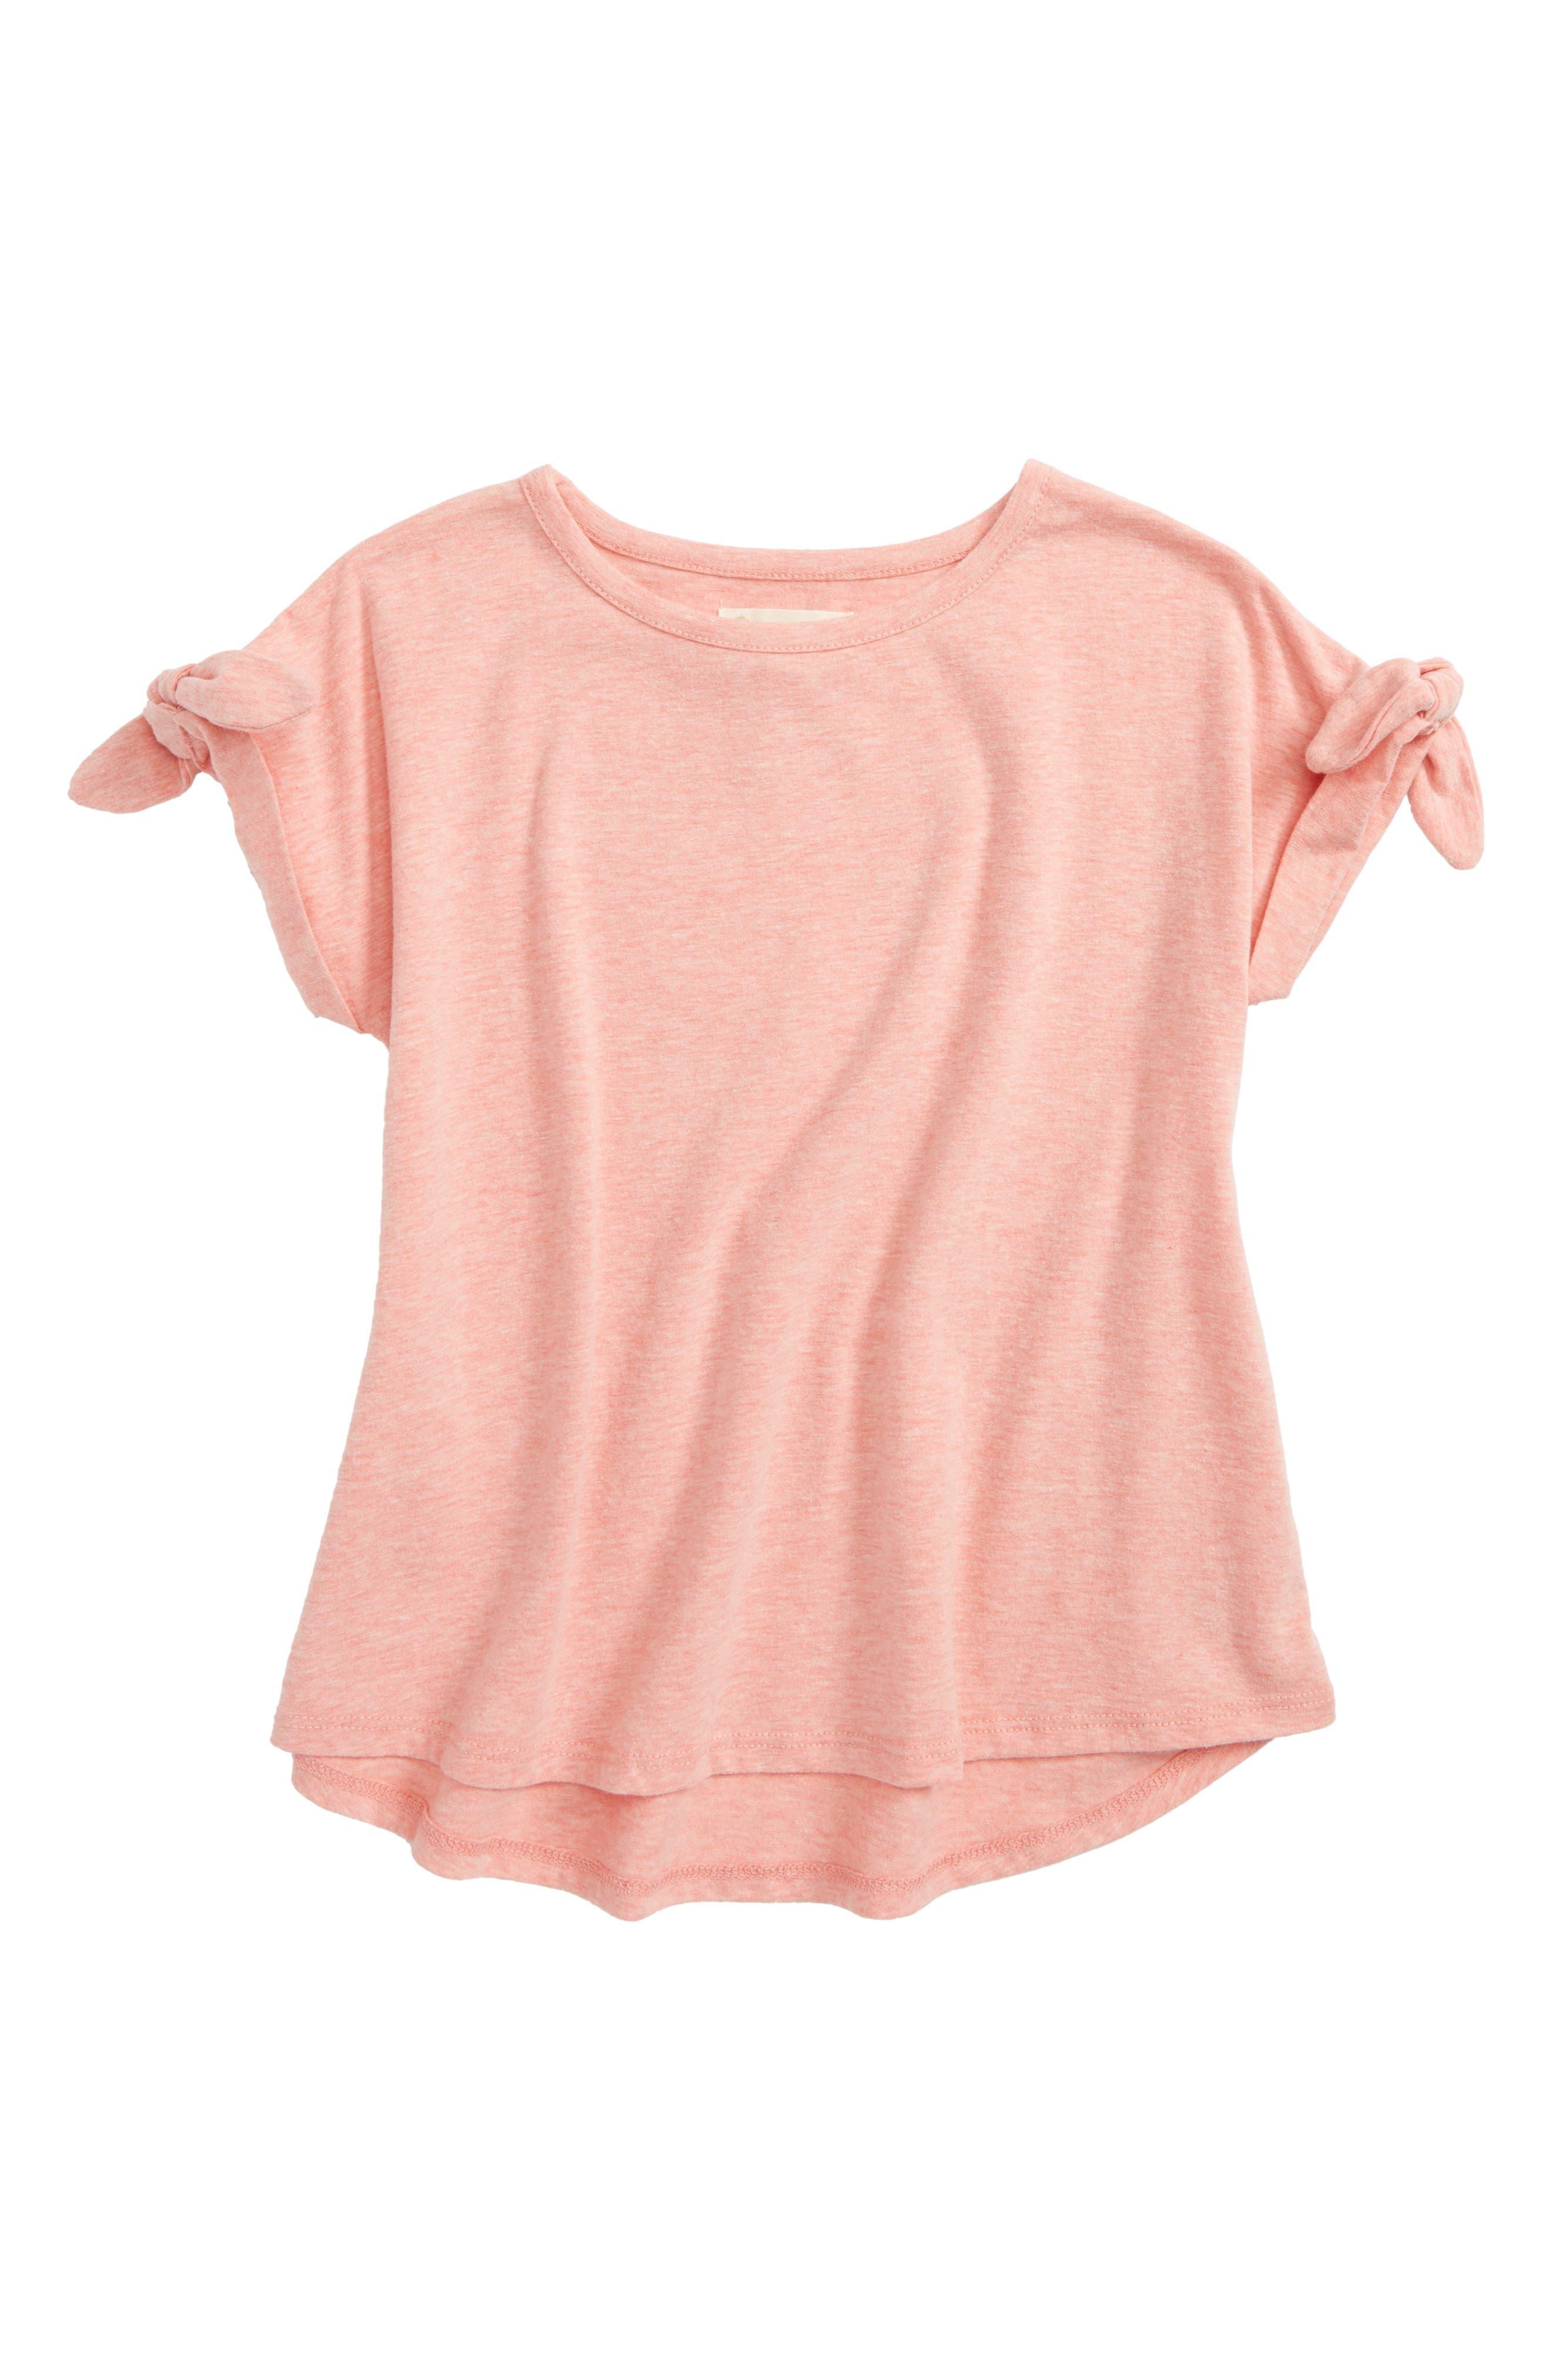 Tie Sleeve Tee,                         Main,                         color, Pink Geranium Heather